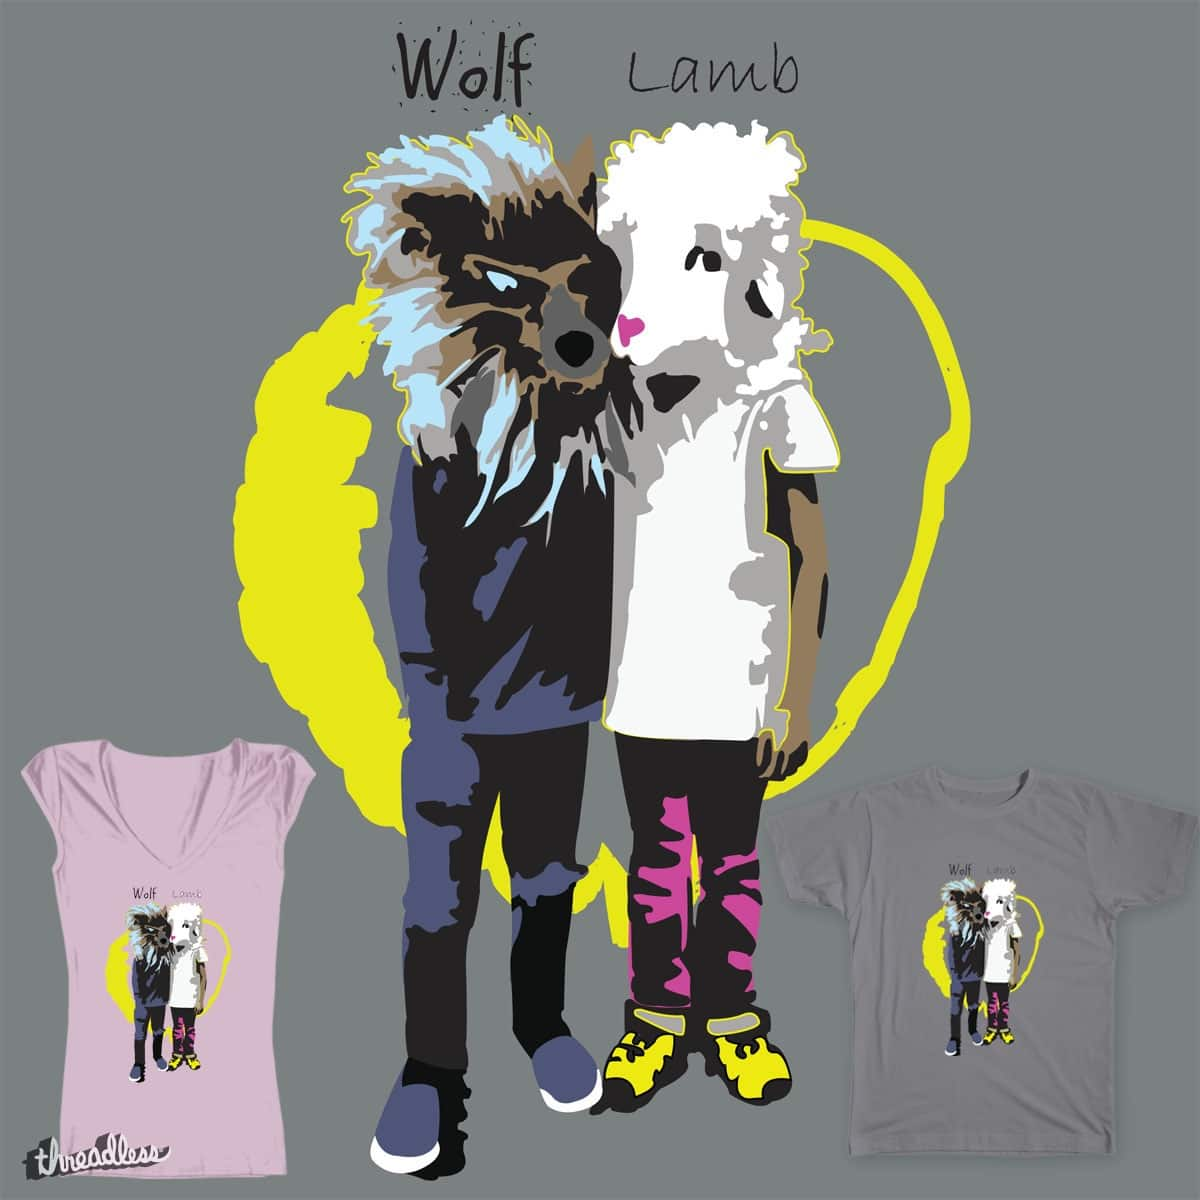 Wolf Lamb by virtu88 on Threadless